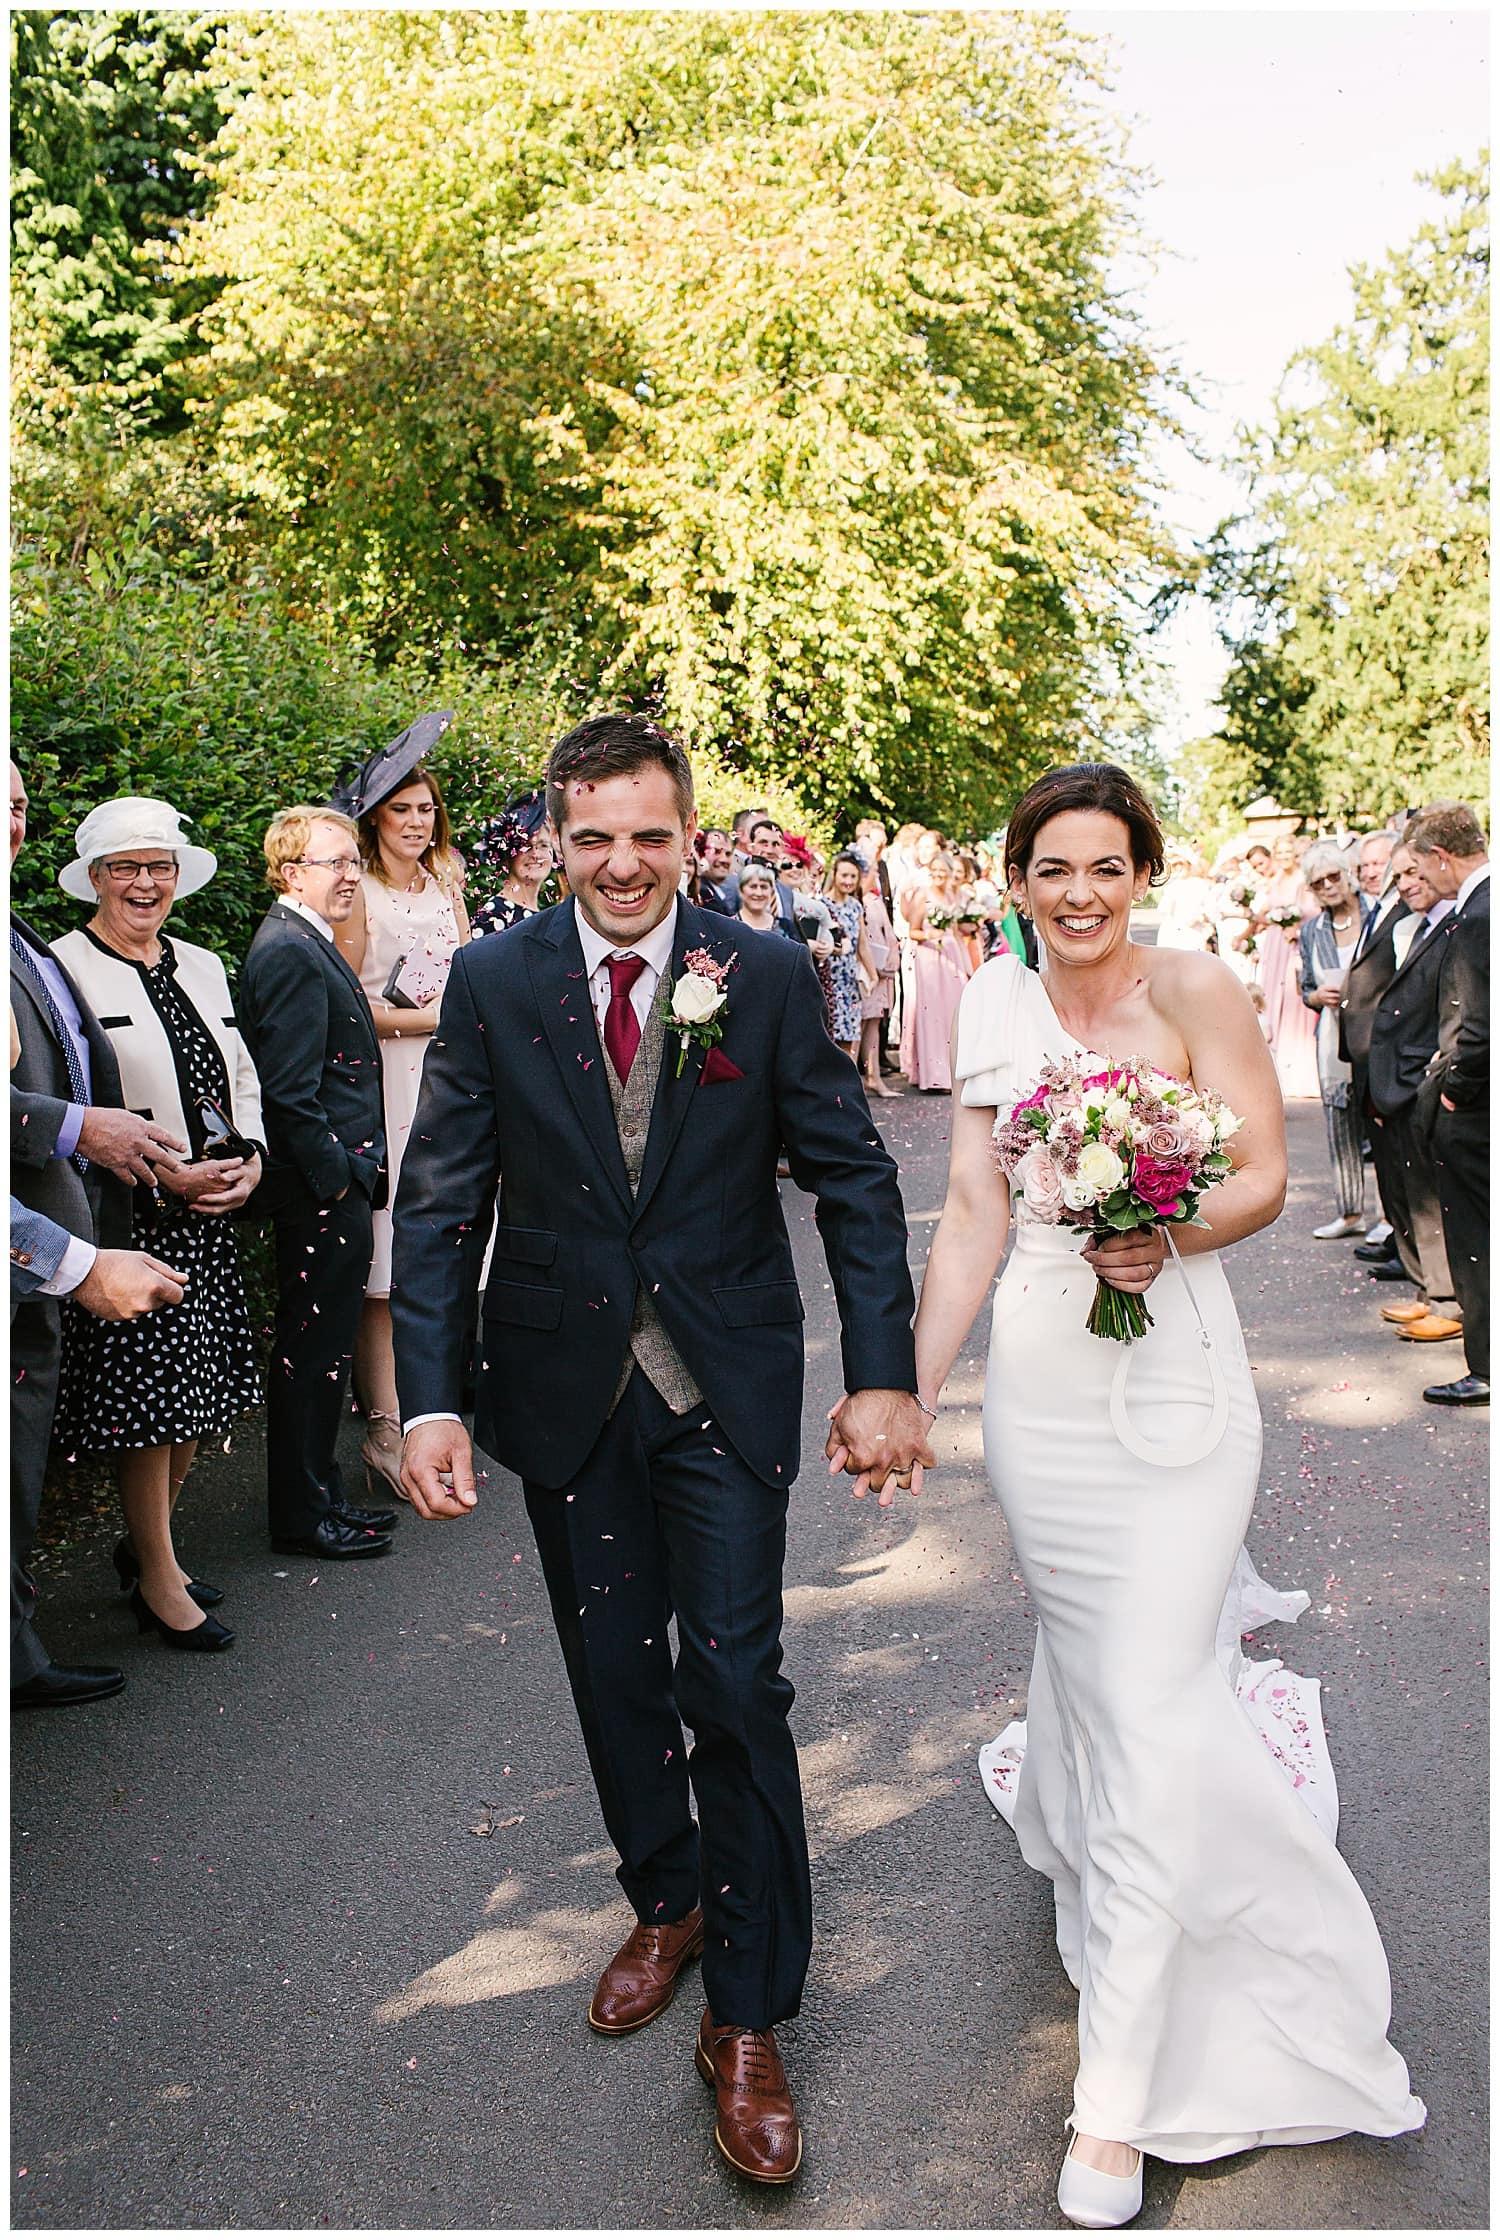 Newly married couple walking through confetti outside Ingestre Church, near Stafford